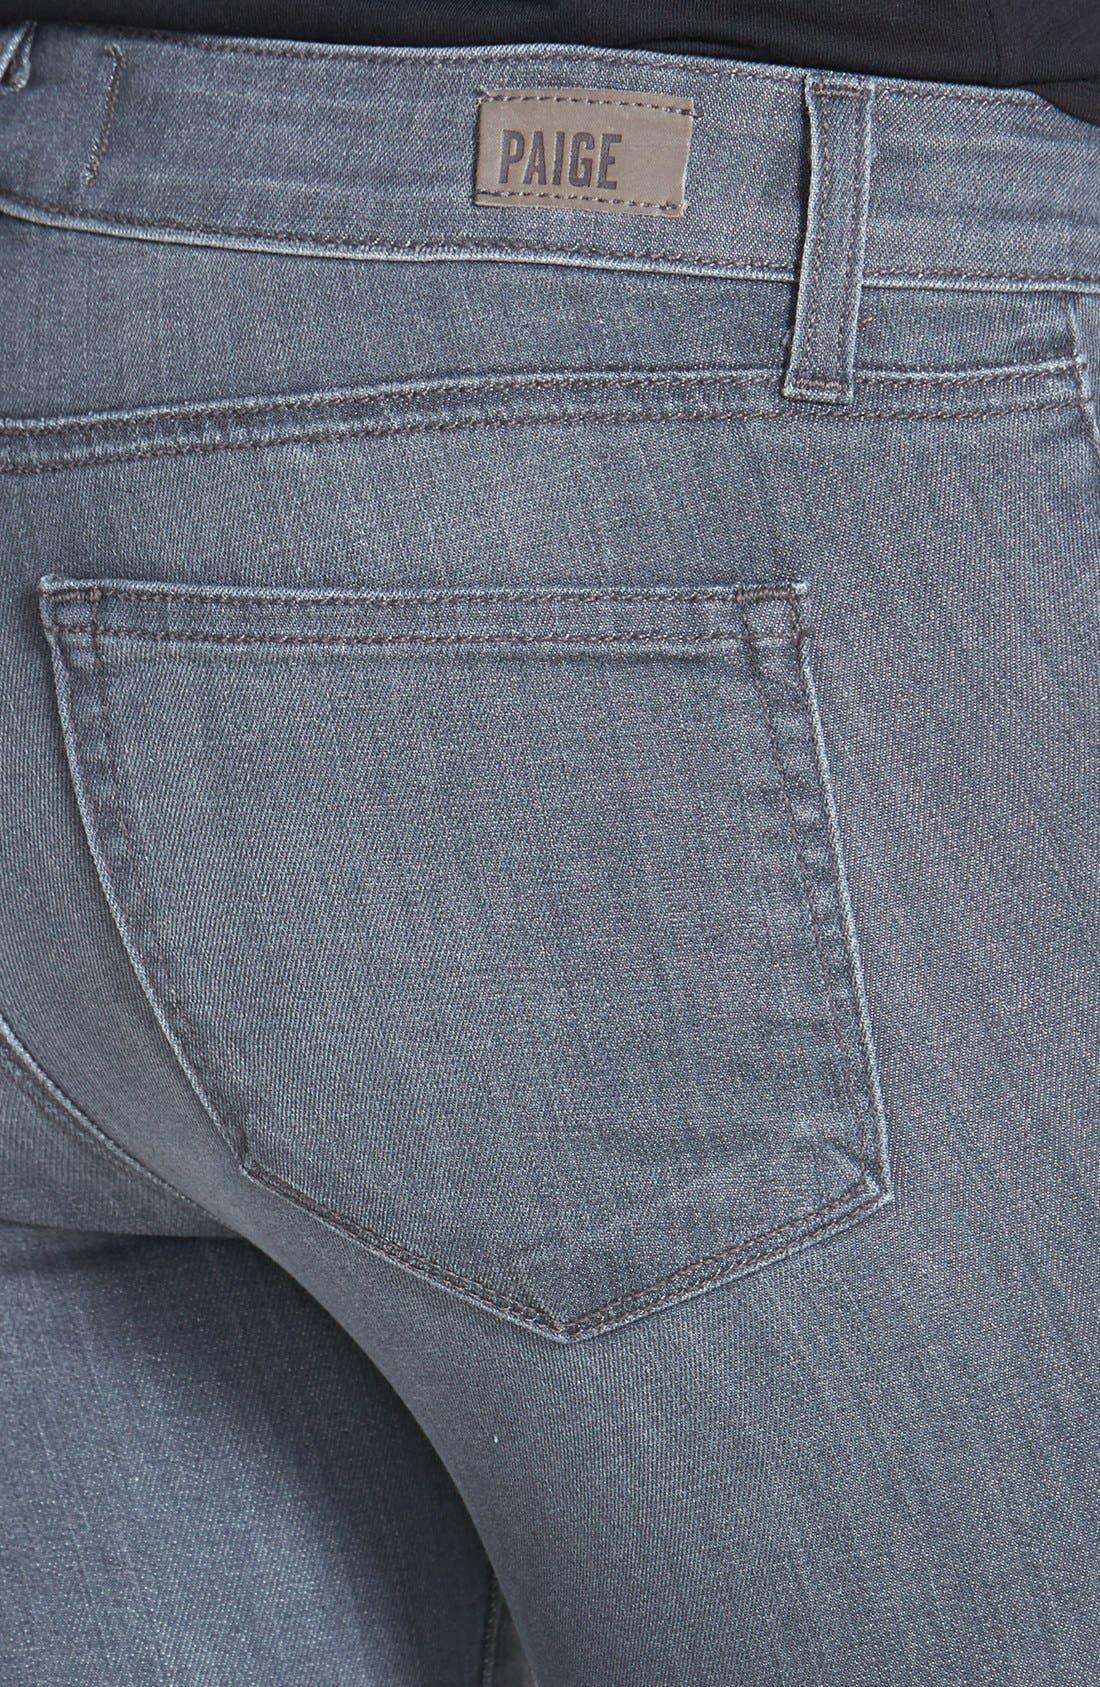 Alternate Image 3  - Paige Denim 'Demi' Ultra Skinny Moto Jeans (Hart)